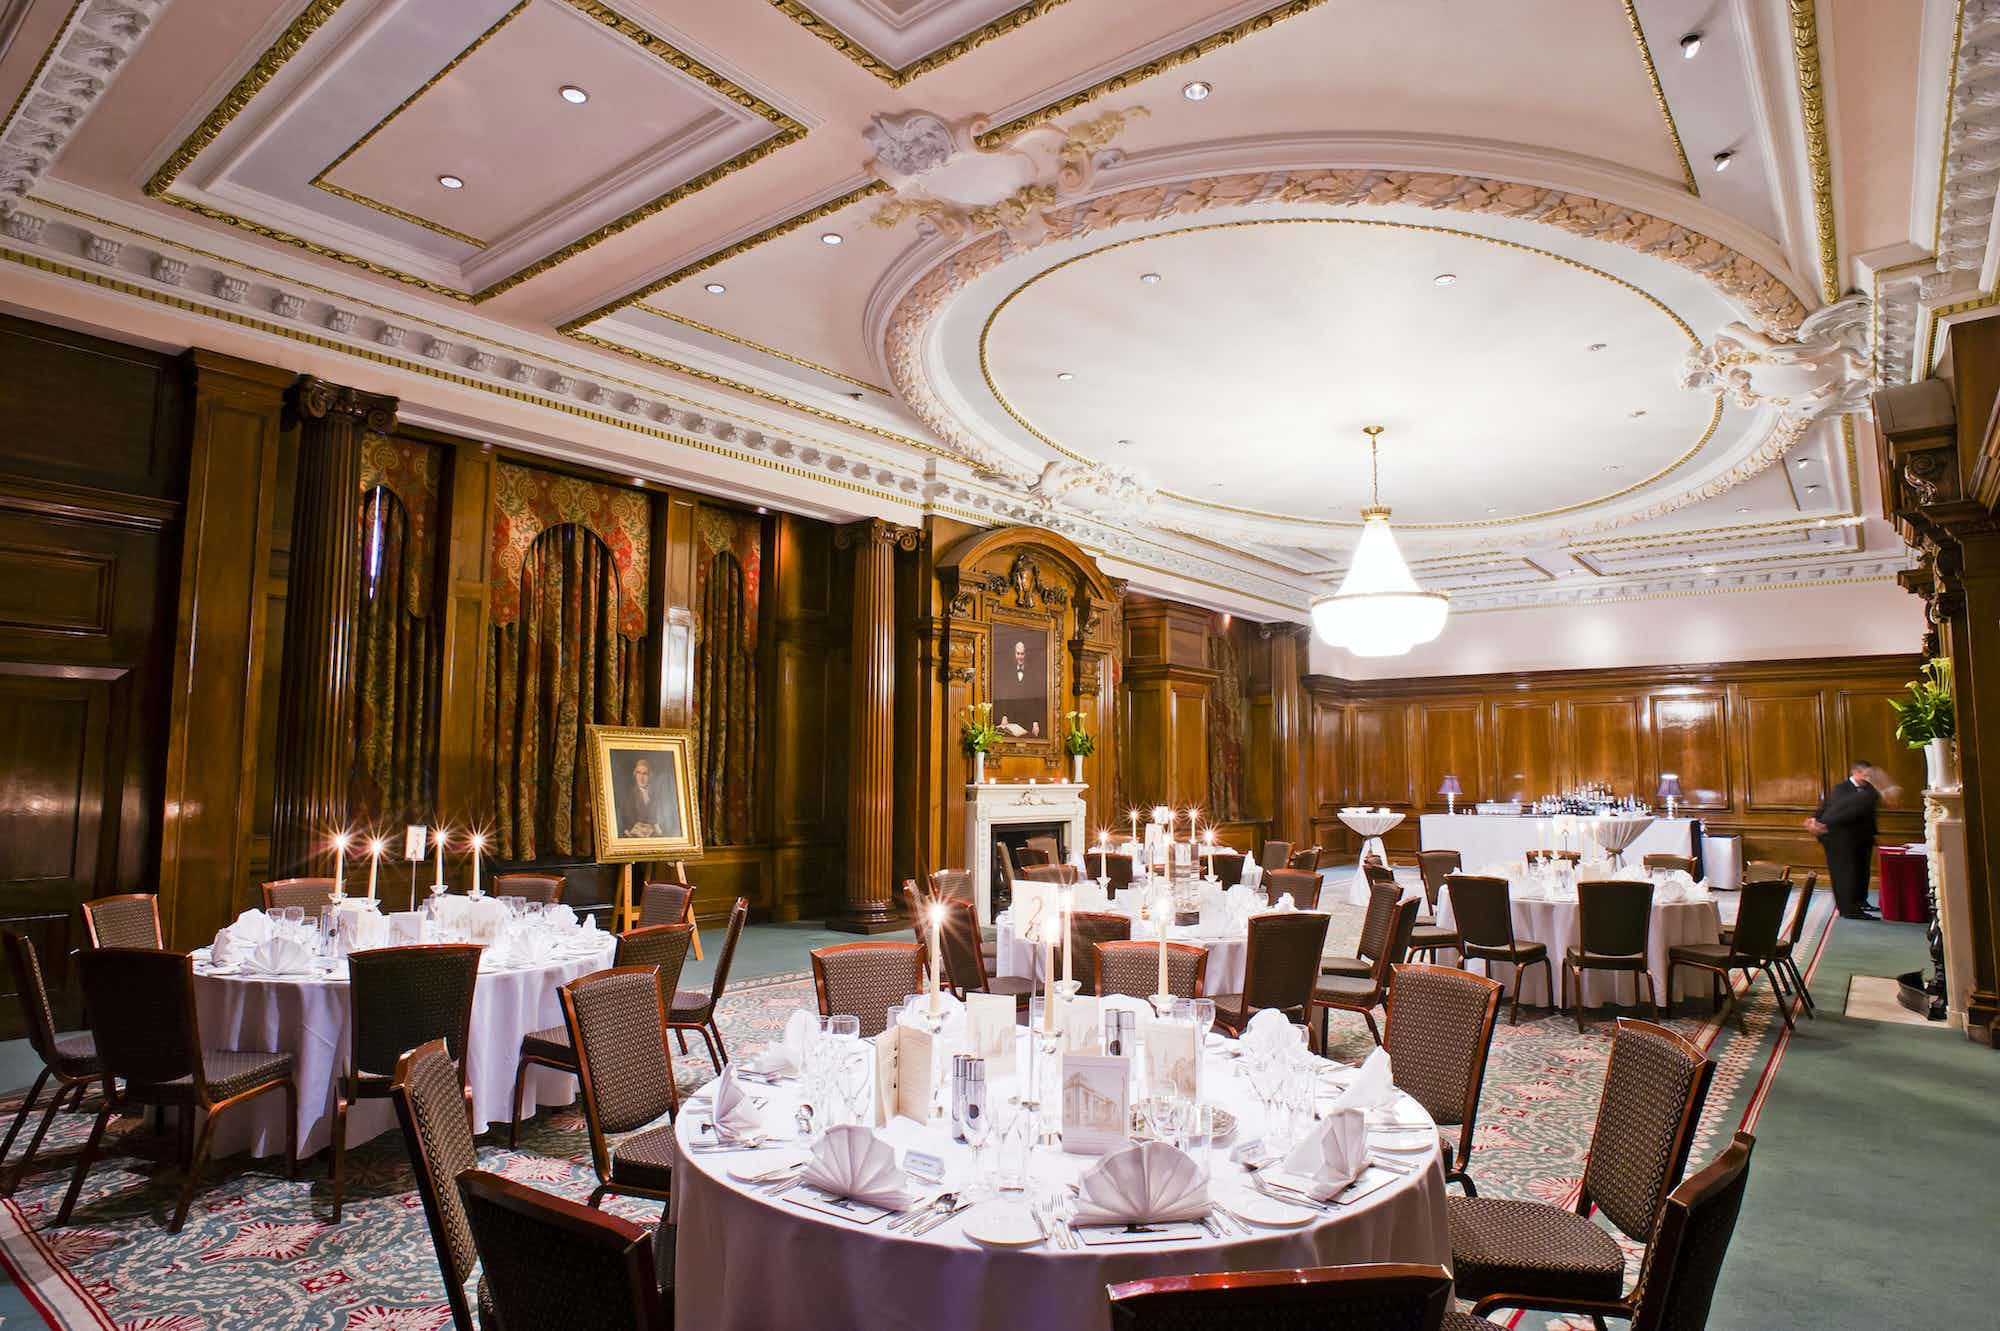 Smeaton Room, One Great George Street